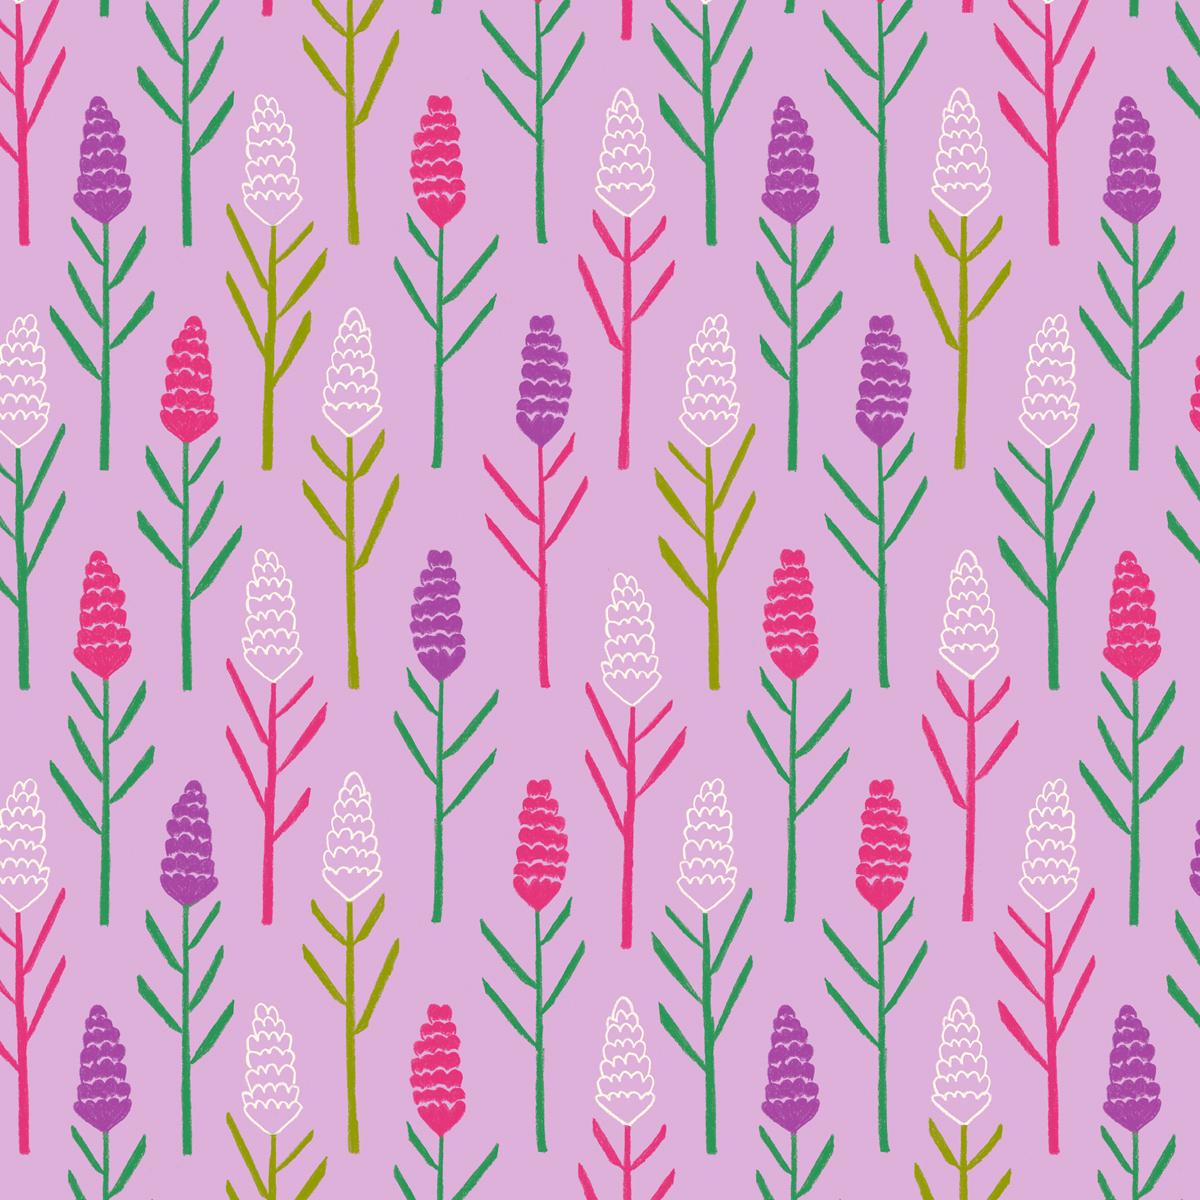 Annalisa Papagna shop - Lavender pattern